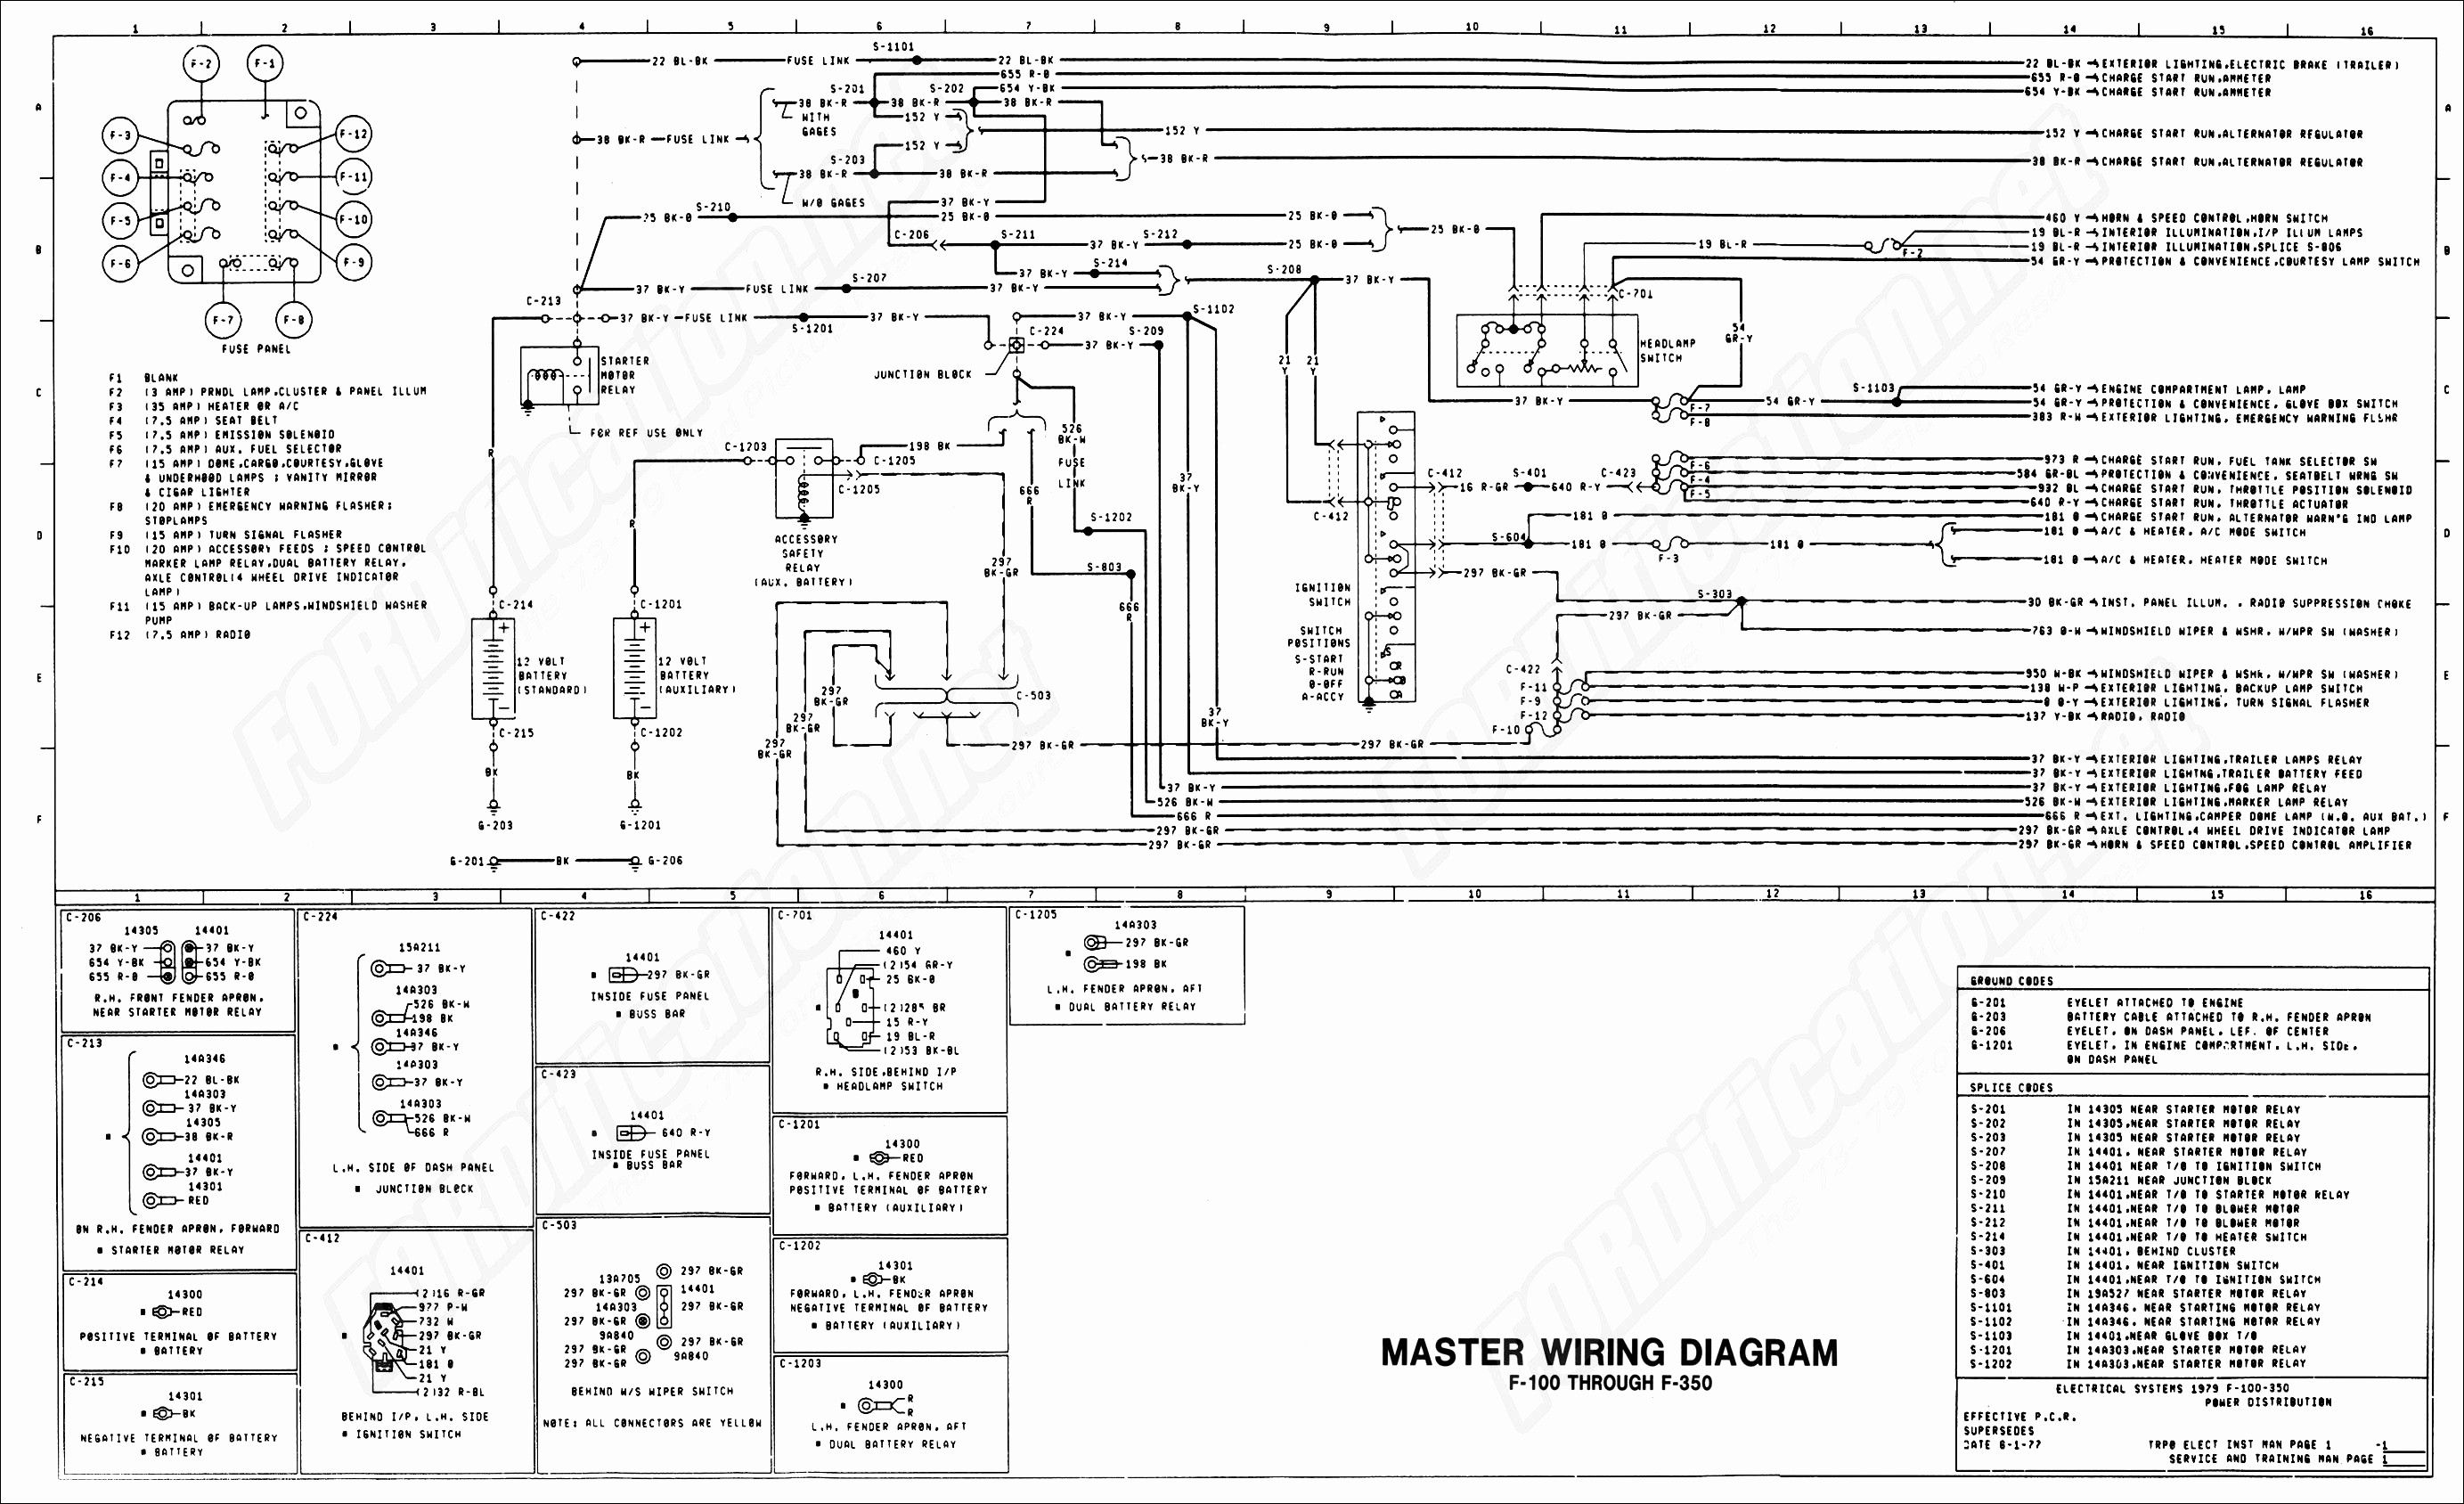 [DIAGRAM] 98 Chevy 1500 Windshield Wiper Wiring Diagram